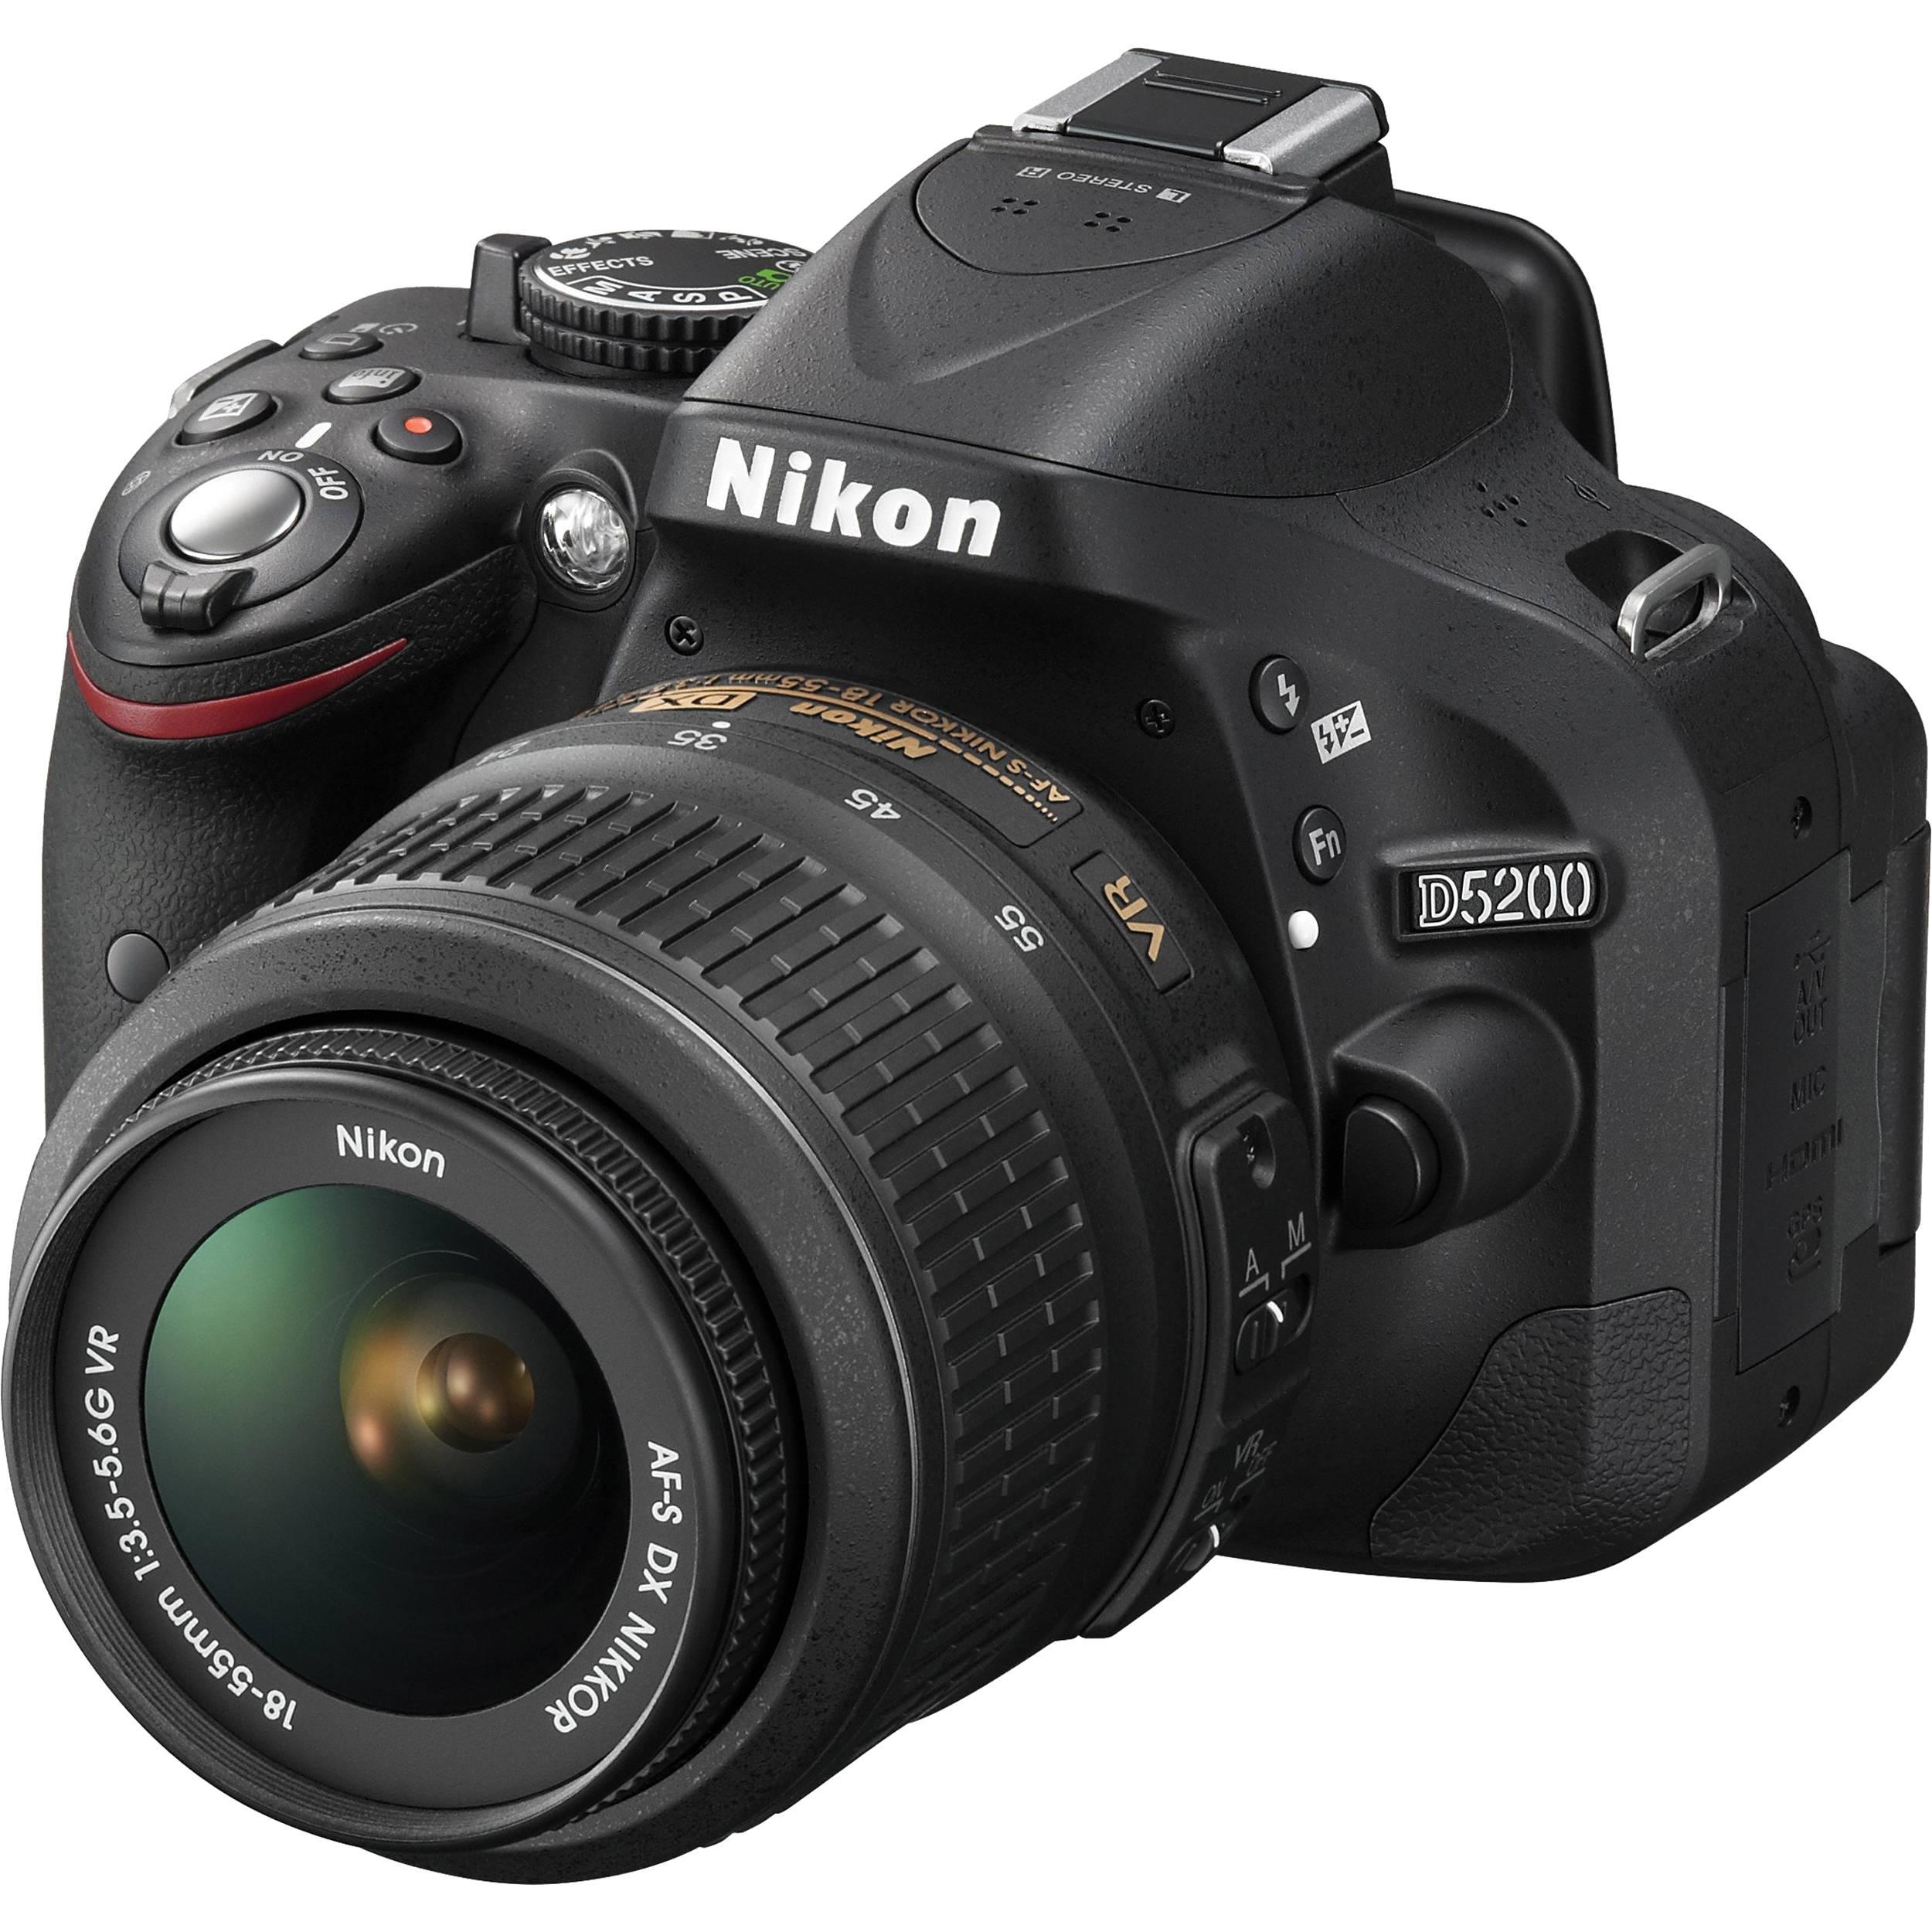 Used Nikon D5200 Dslr Camera With 18 55mm Lens Black 1503 B H